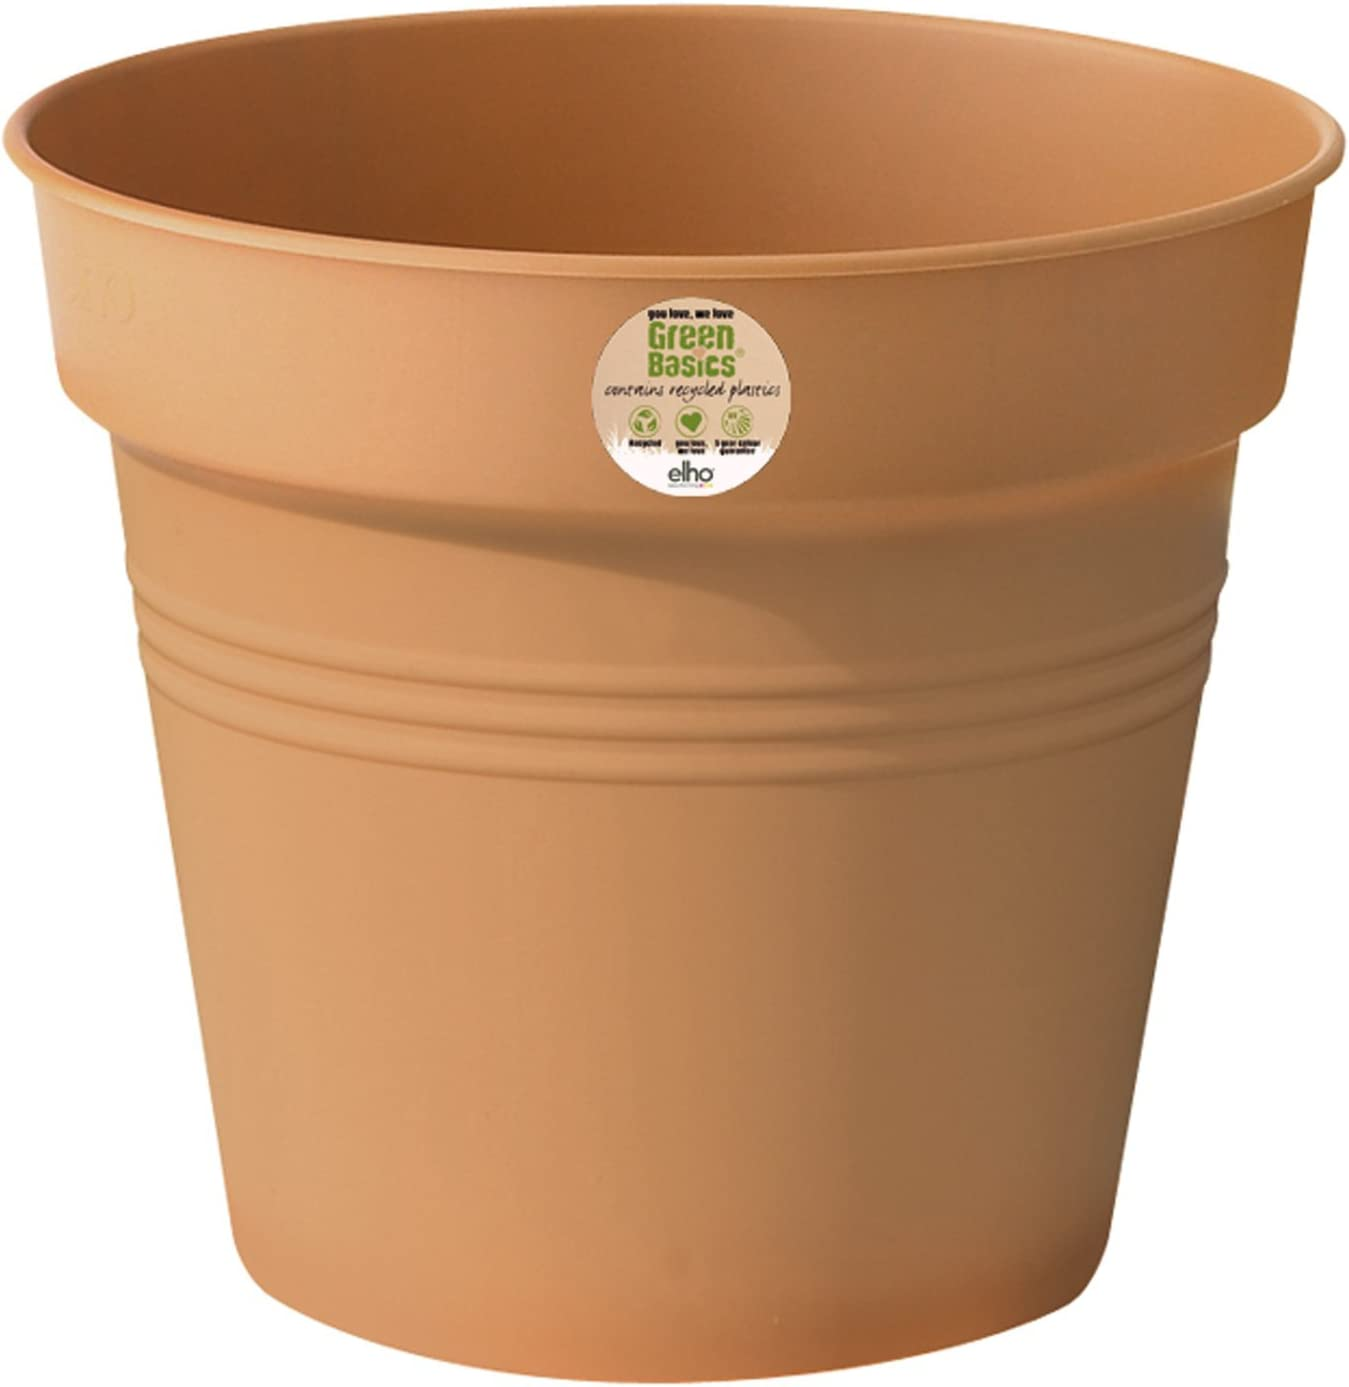 /Ø 19 x A 17.5 cm Elho Green Basics Growpot 19 Growpot Mild Terra Interior /& Exterior